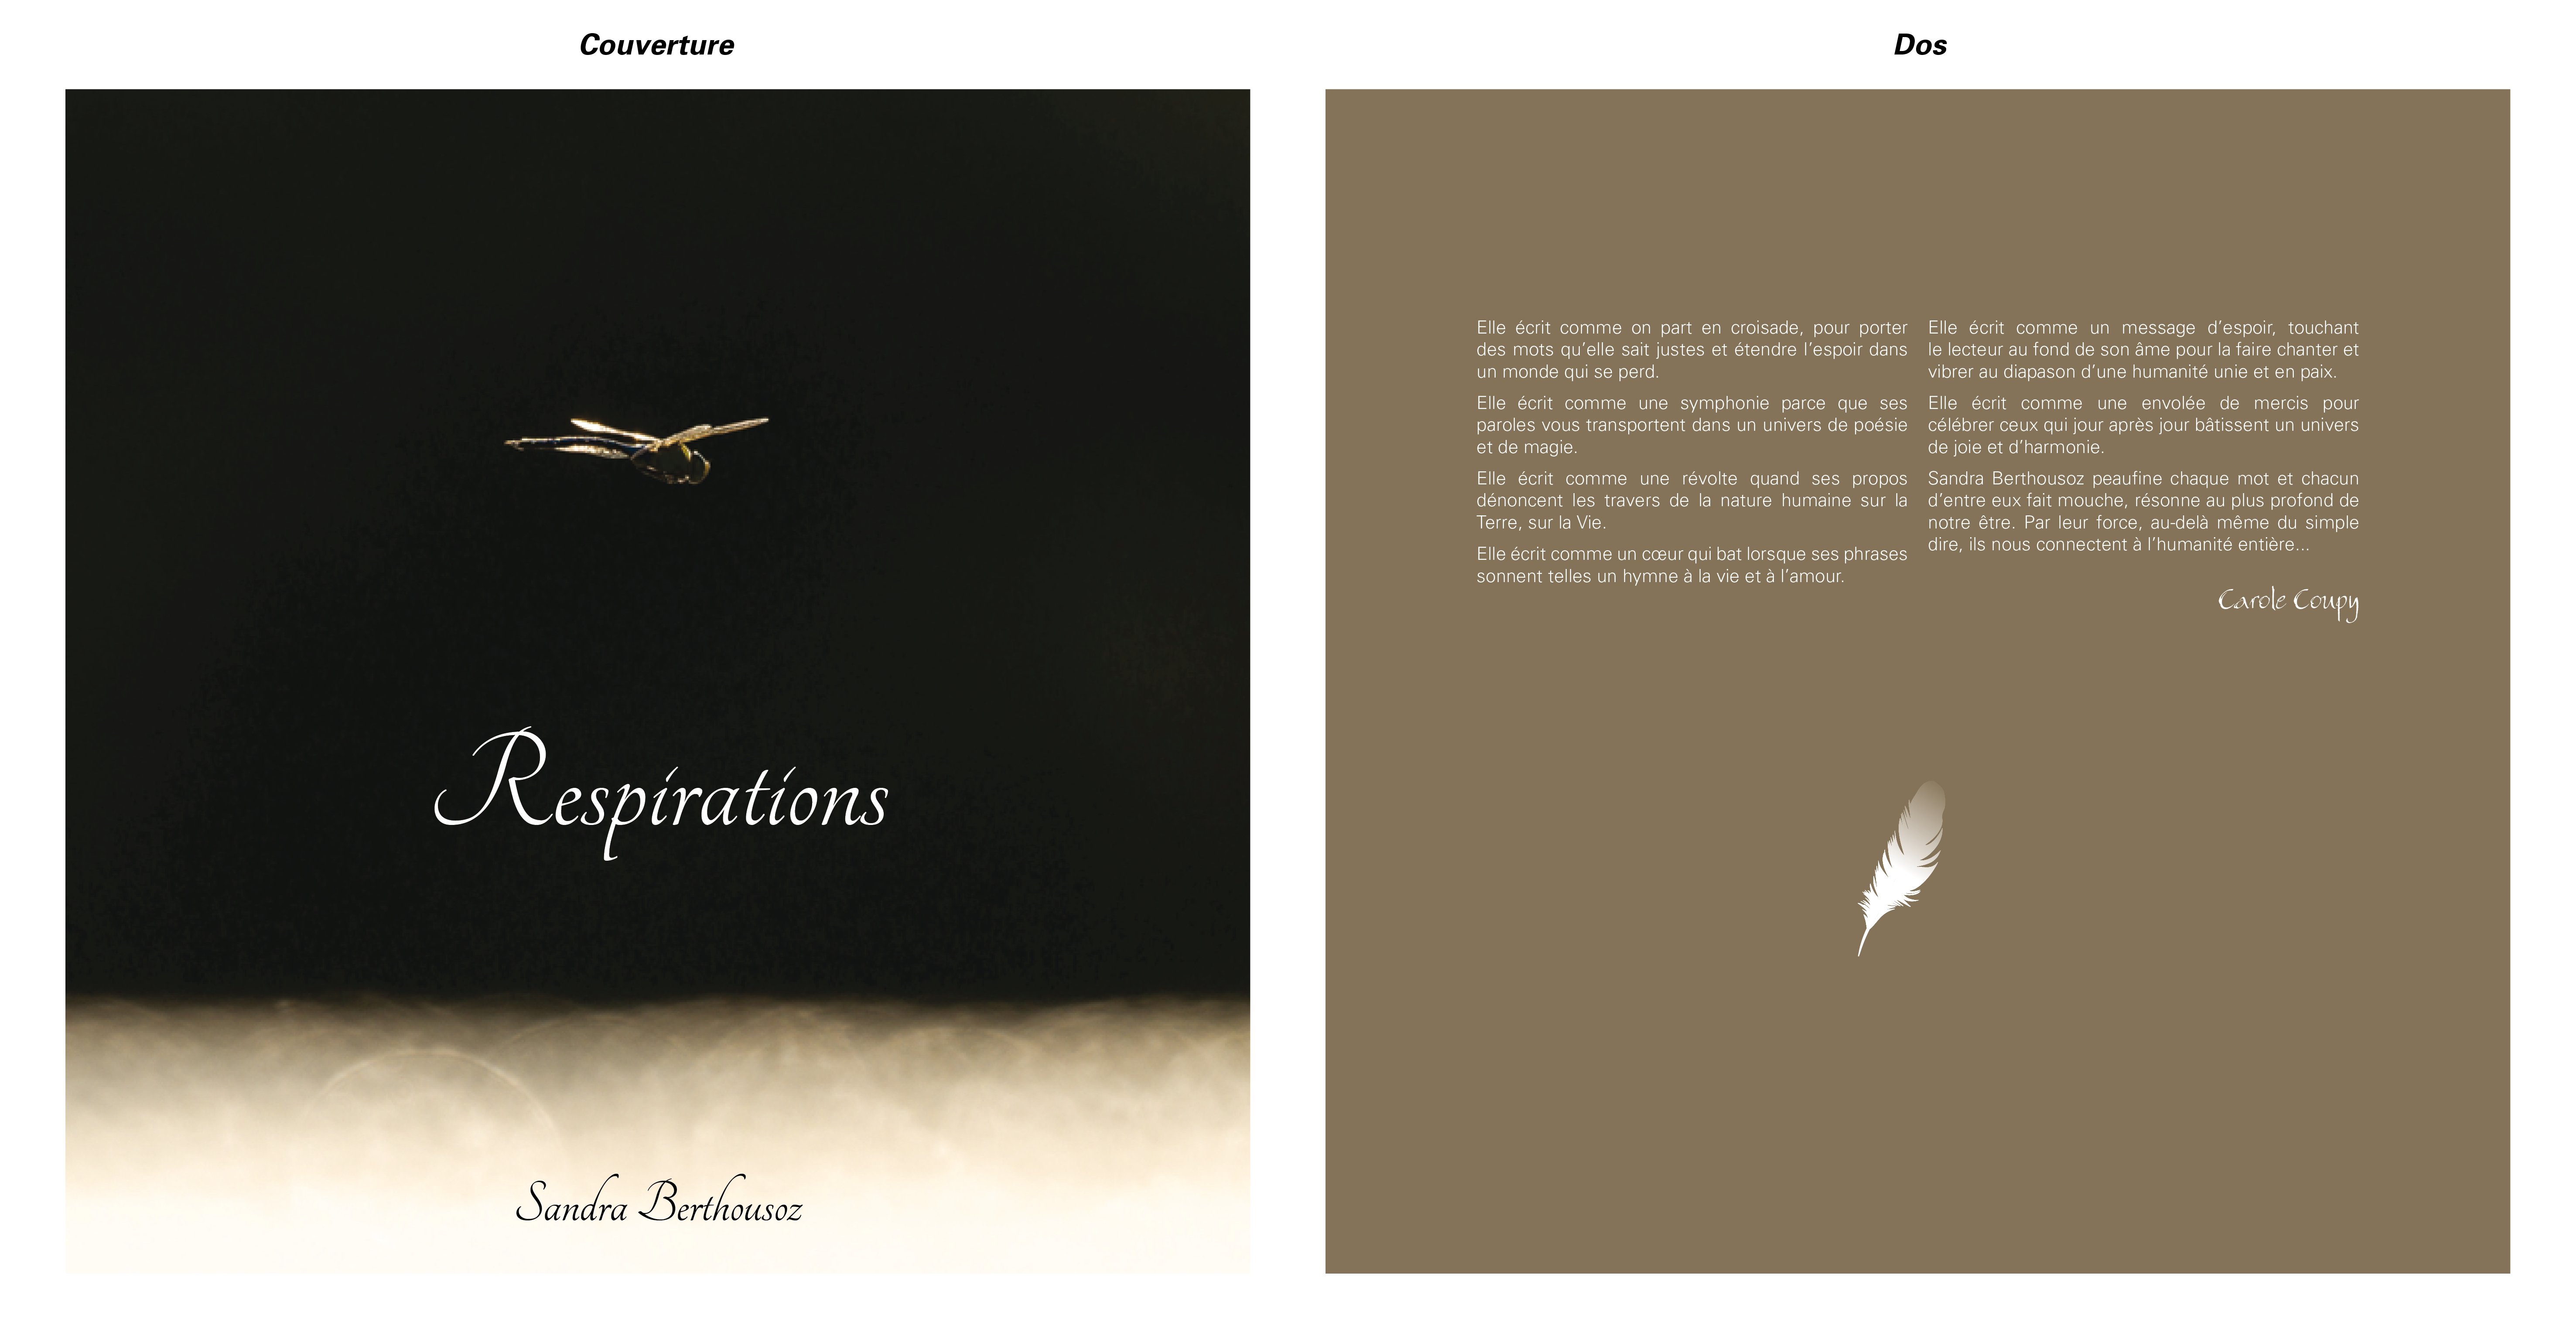 Sandra Berthousoz - Respirations